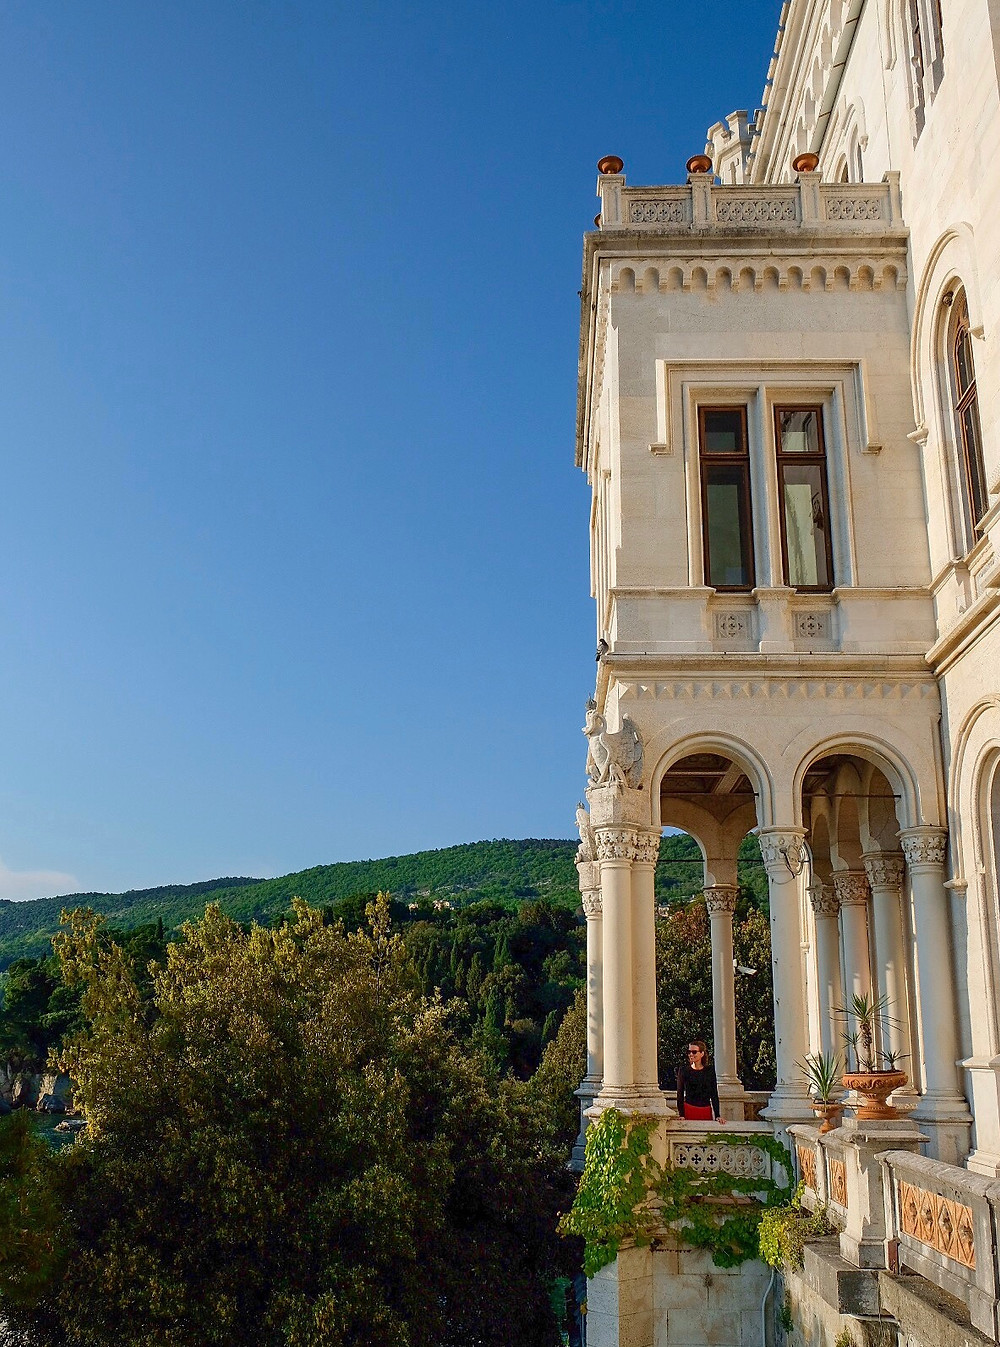 Lonnies Planet at Miramare Castle Trieste